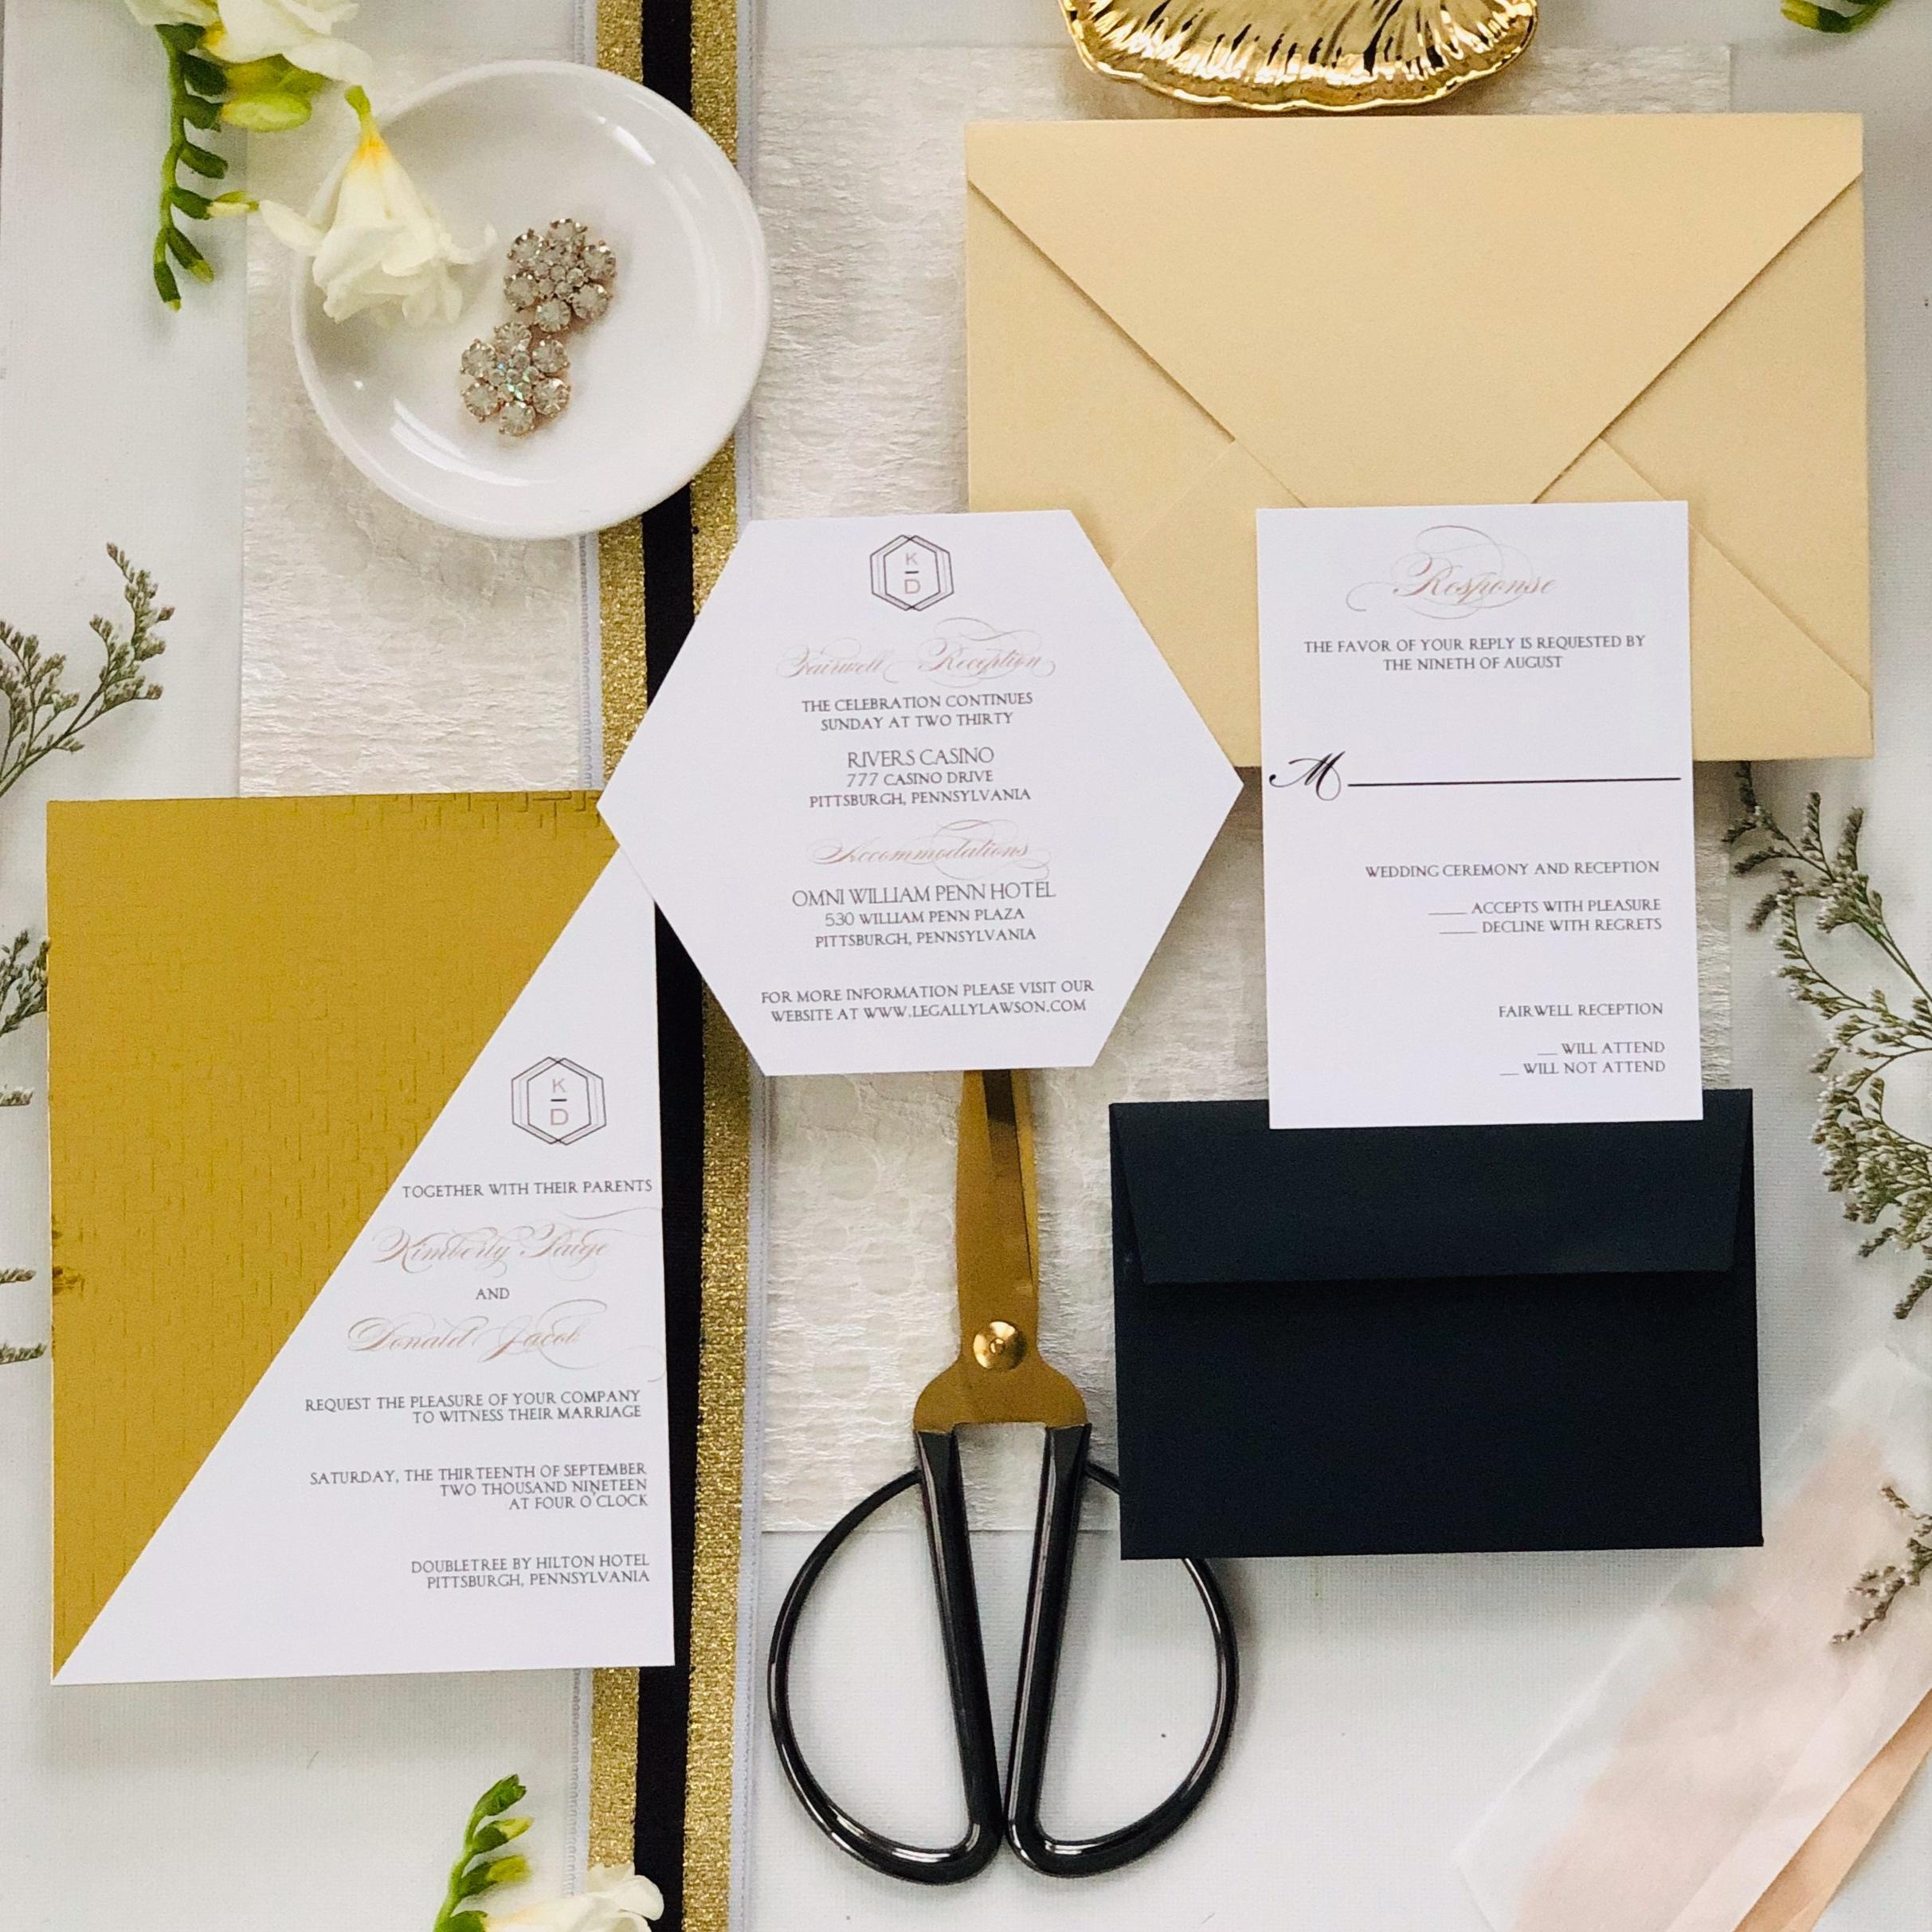 Modern-Glam-Black-and-Gold-Wedding-Invitation-by-K-Flowers-Designs